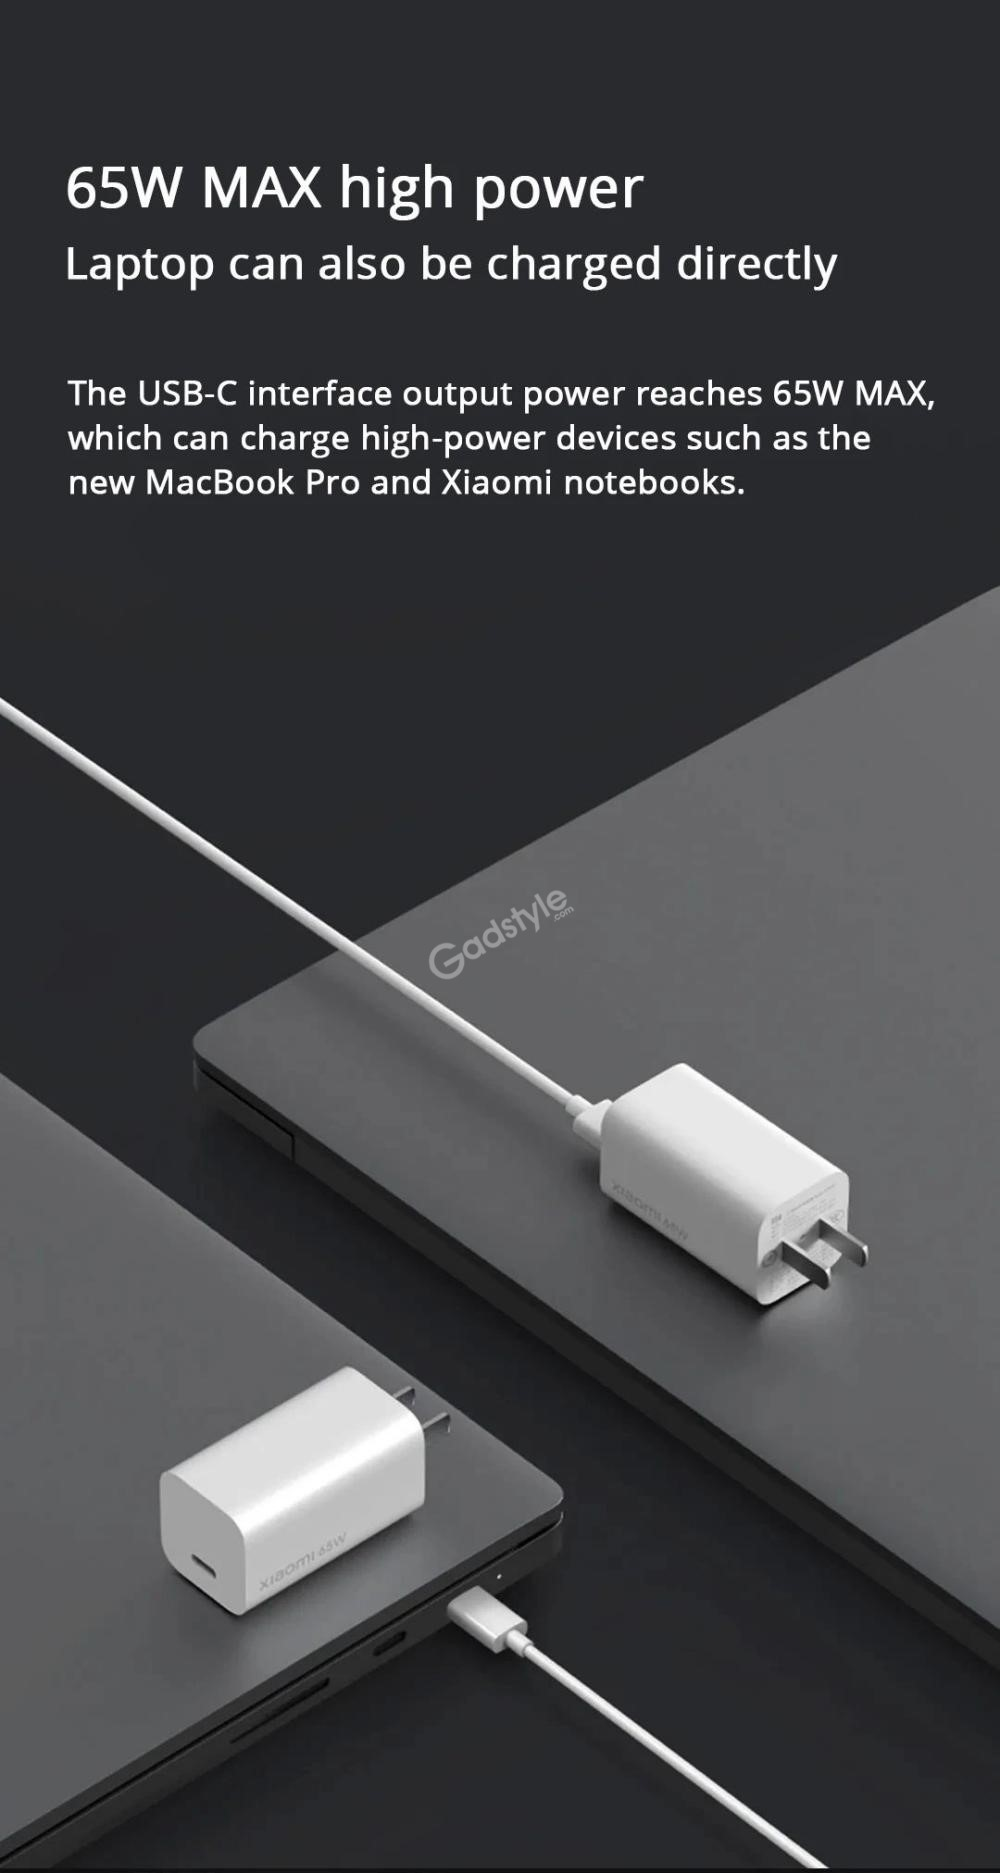 Xiaomi Mi Gan Charger 65w Type C Usb Charger (1)